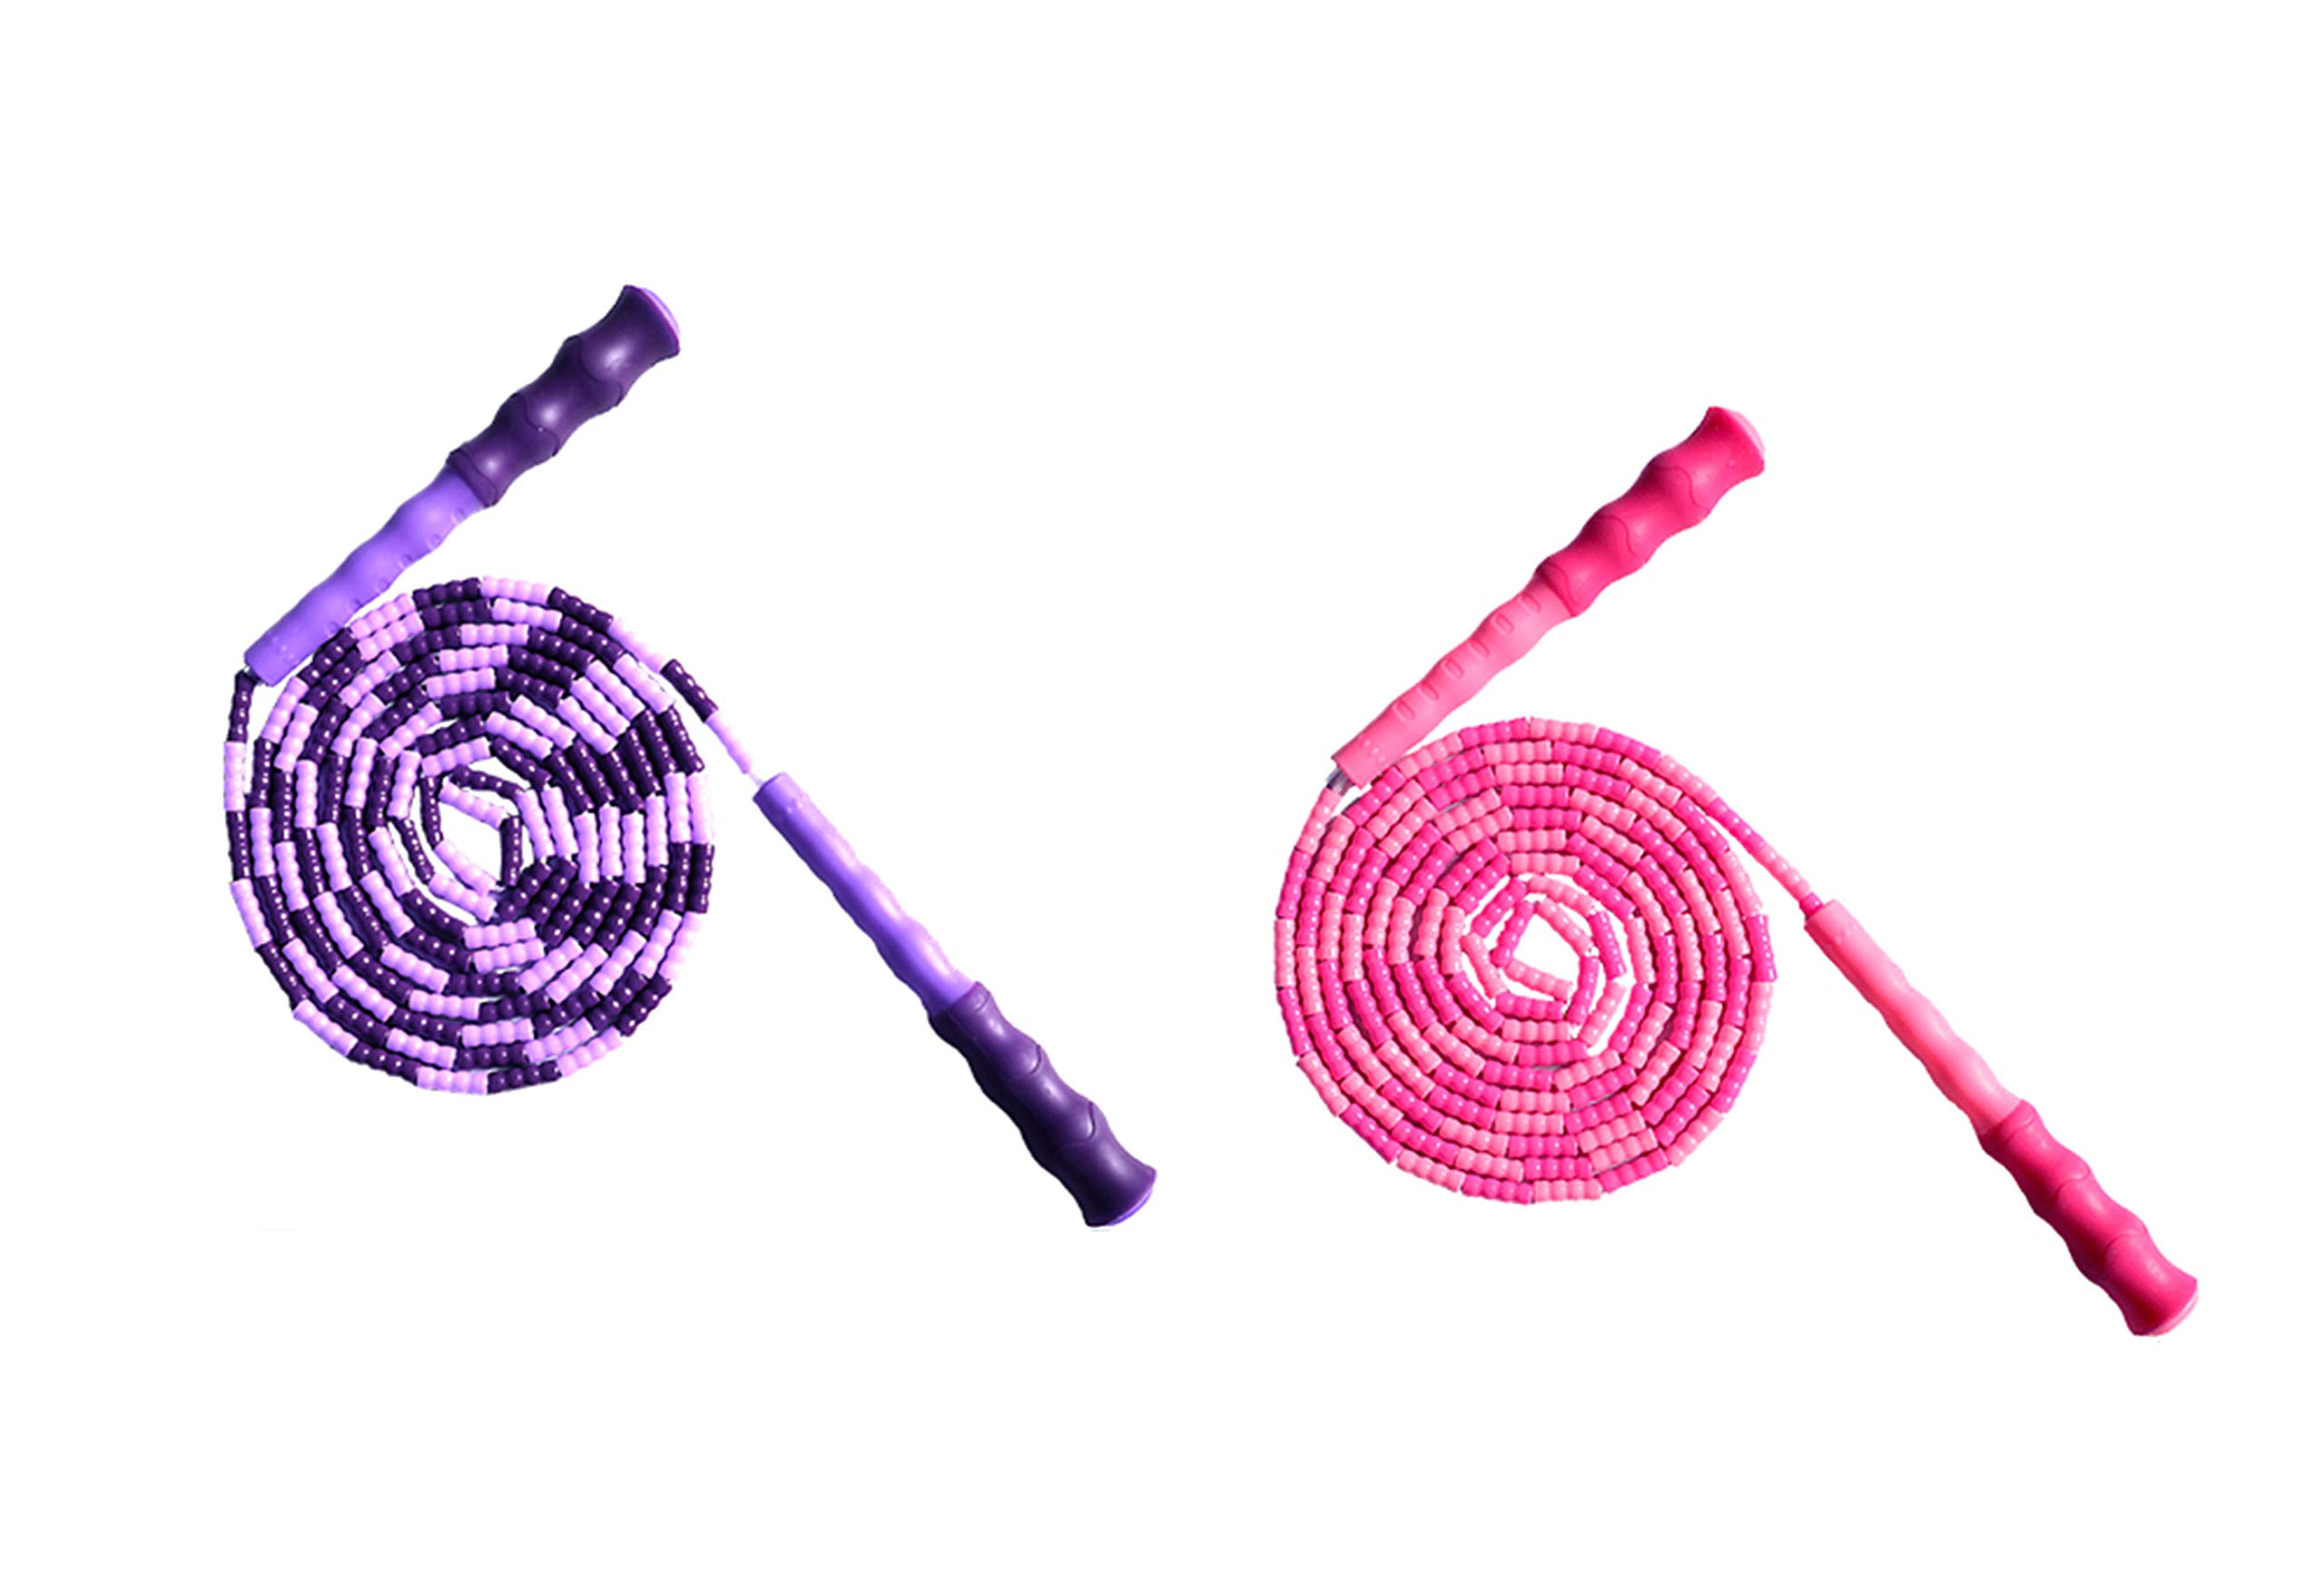 LETUSPORT 9 Feet Adjustable Beaded Segmented Jump Rope for Women Men Kids Lightweight Work Out Speeding Jumping Ropes (Pink+Purple, 2 pcs)